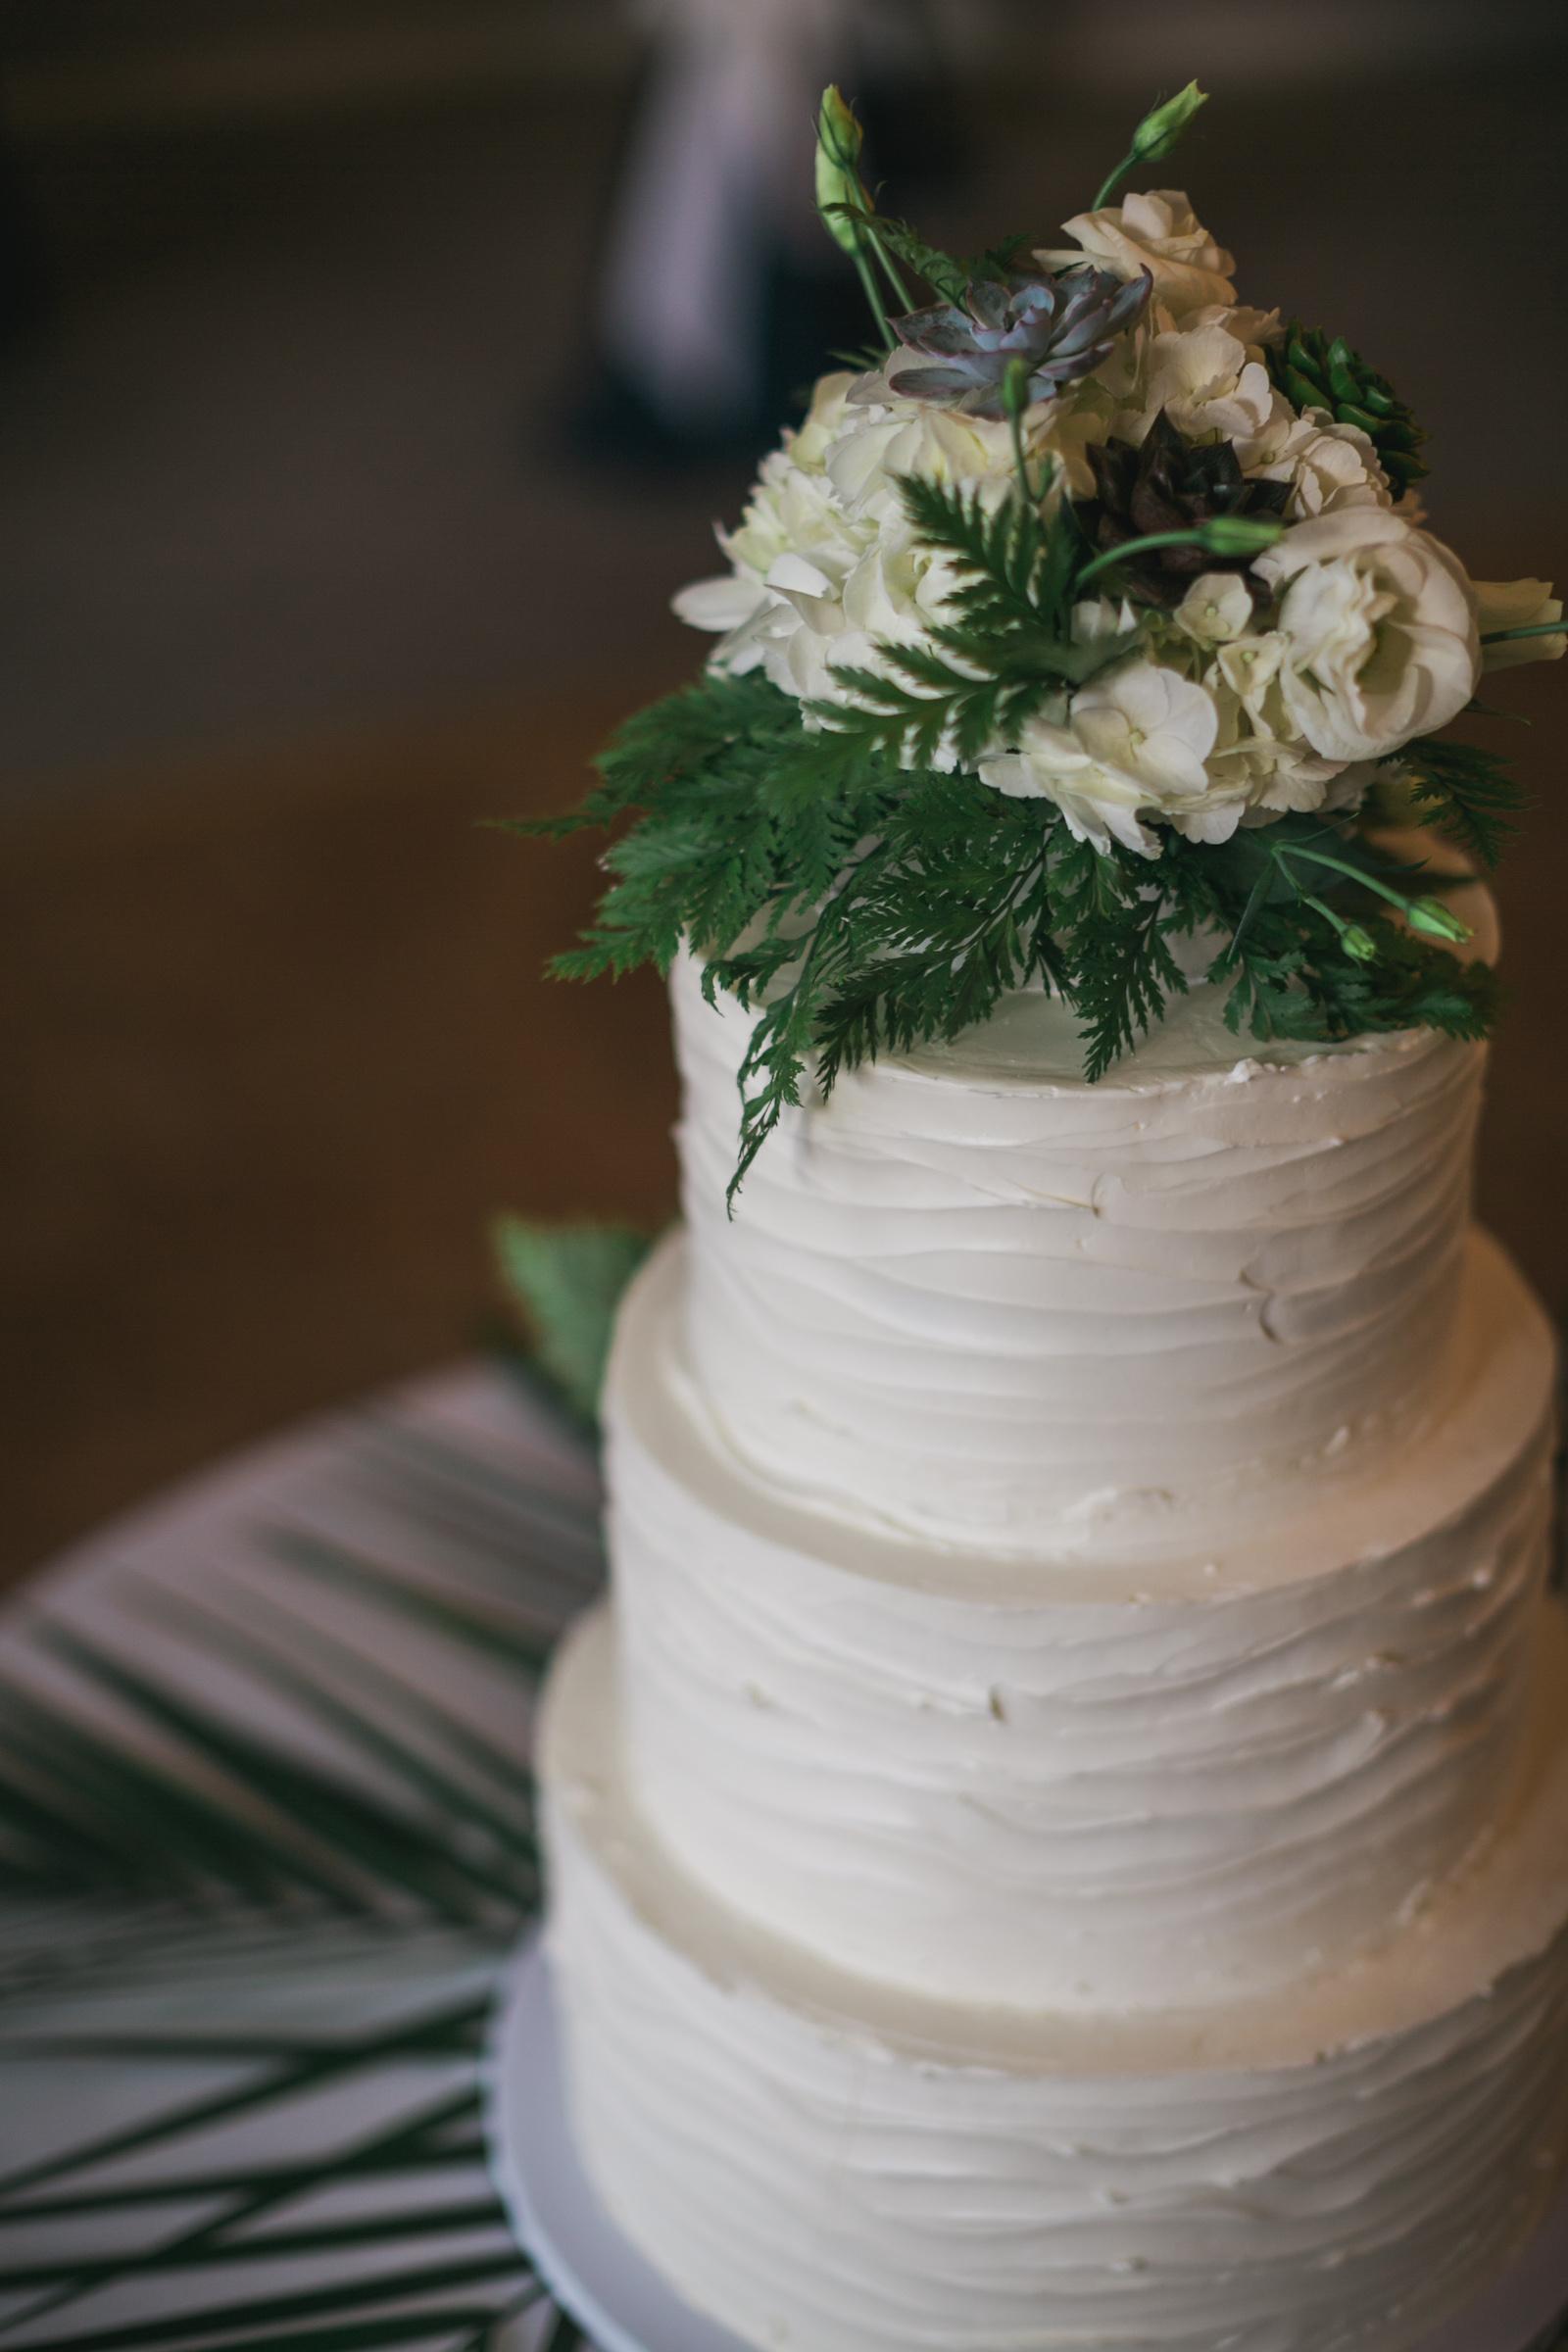 wisconsin-wedding-acowsay-uttke-photography-48.jpg